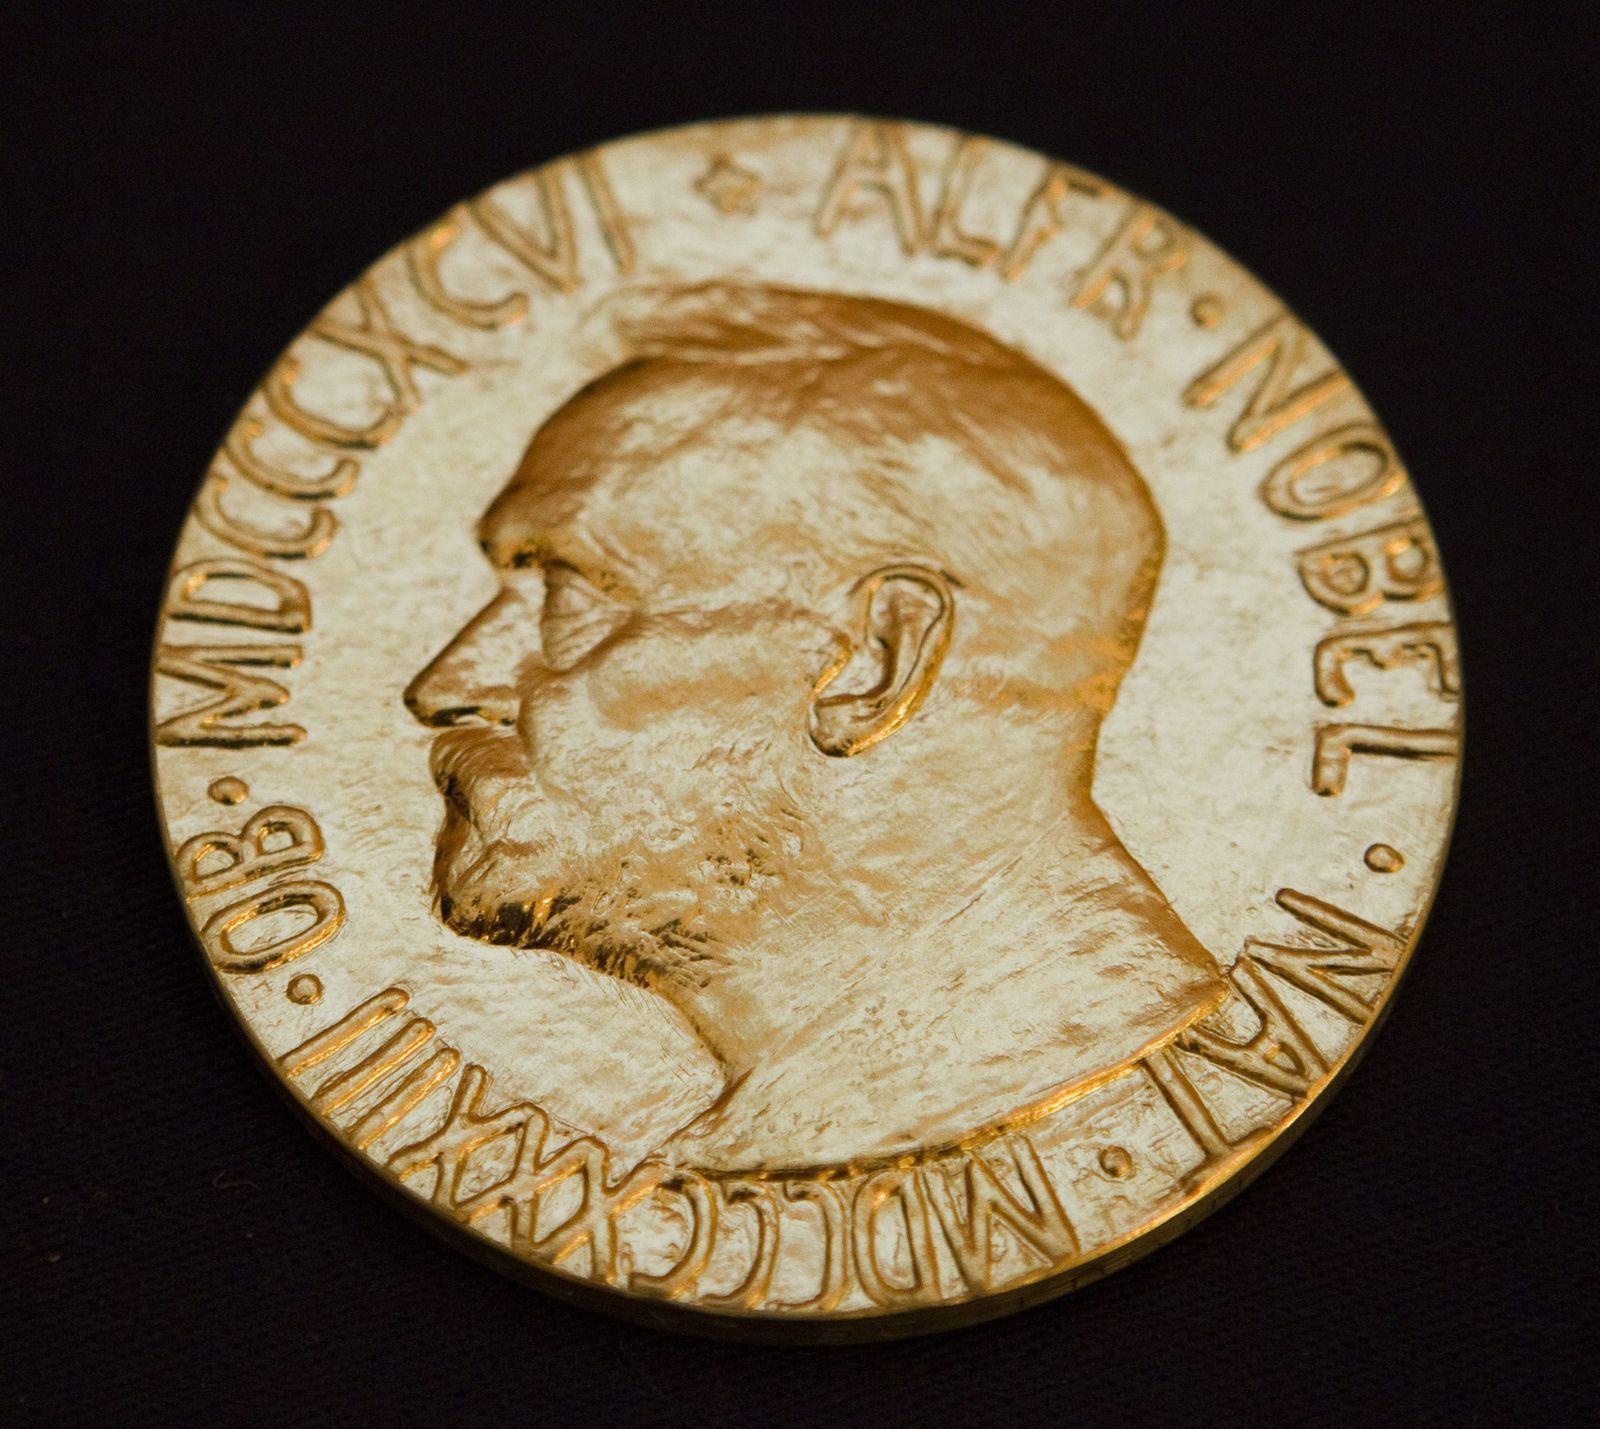 Friedensnobelpreis Medallie